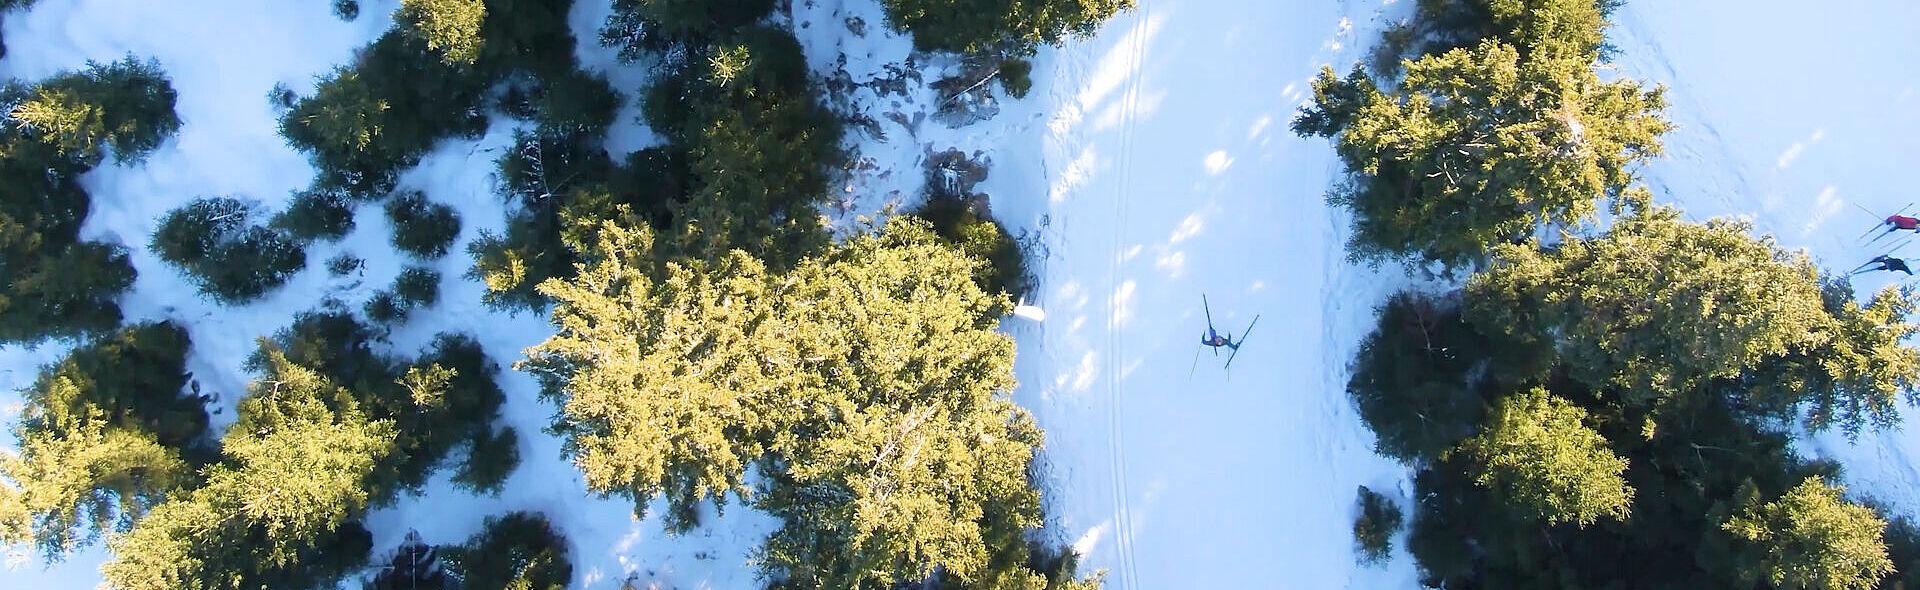 Skilanglauf Oberwiesenthal Ausdauersport Trainingszentrum Sparkassen-Skiarena